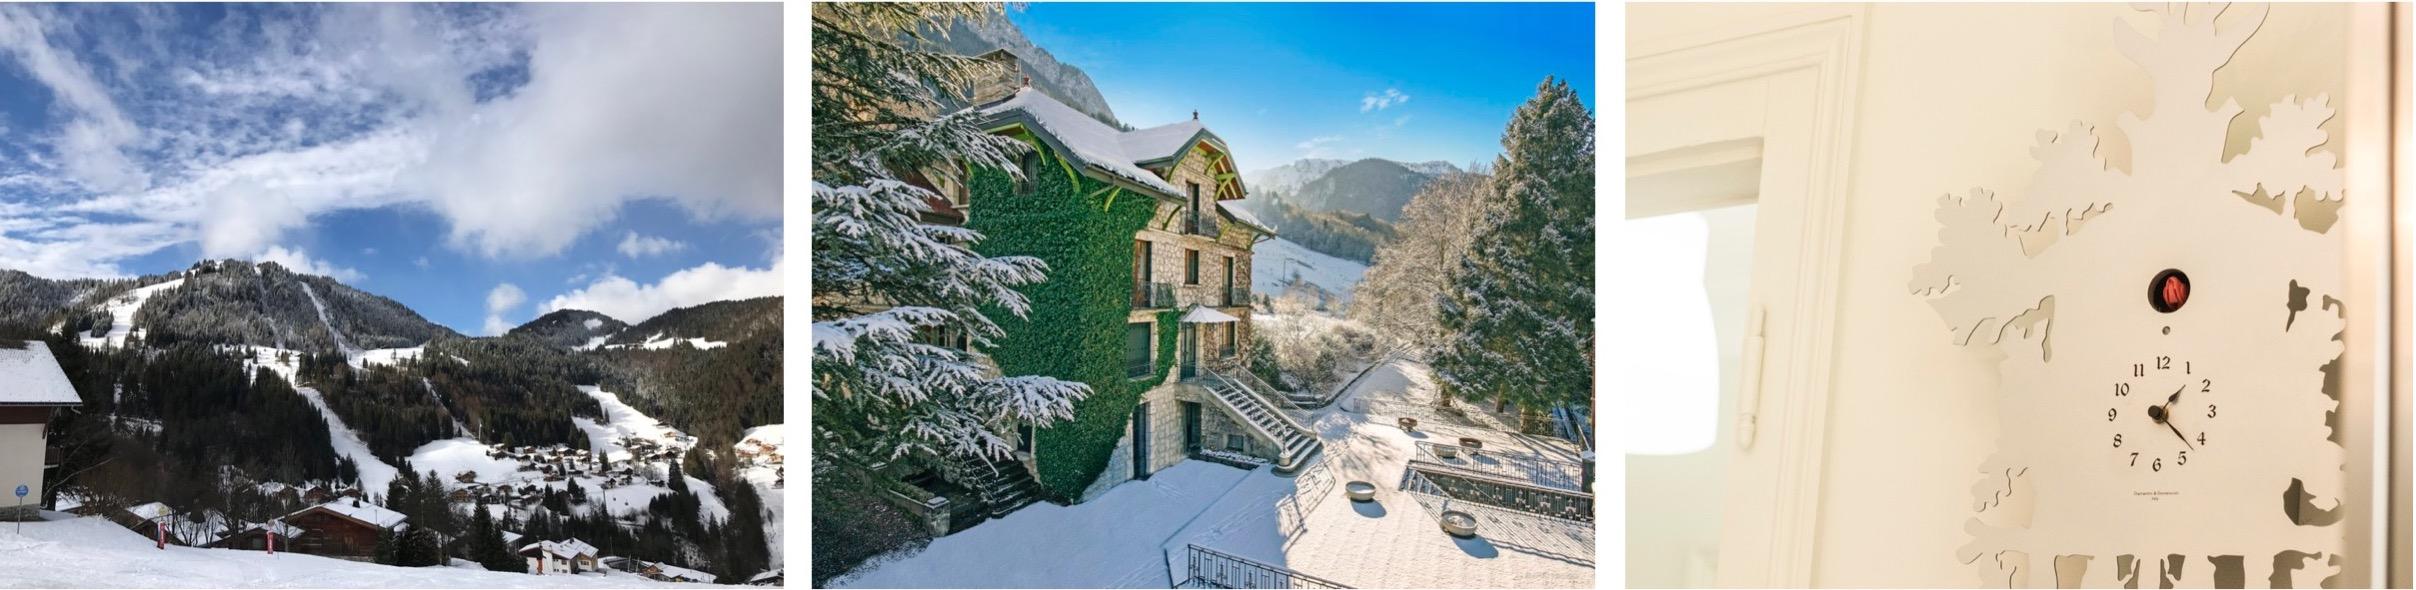 The Mayor's House La Clusaz Ski Chalet.jpg